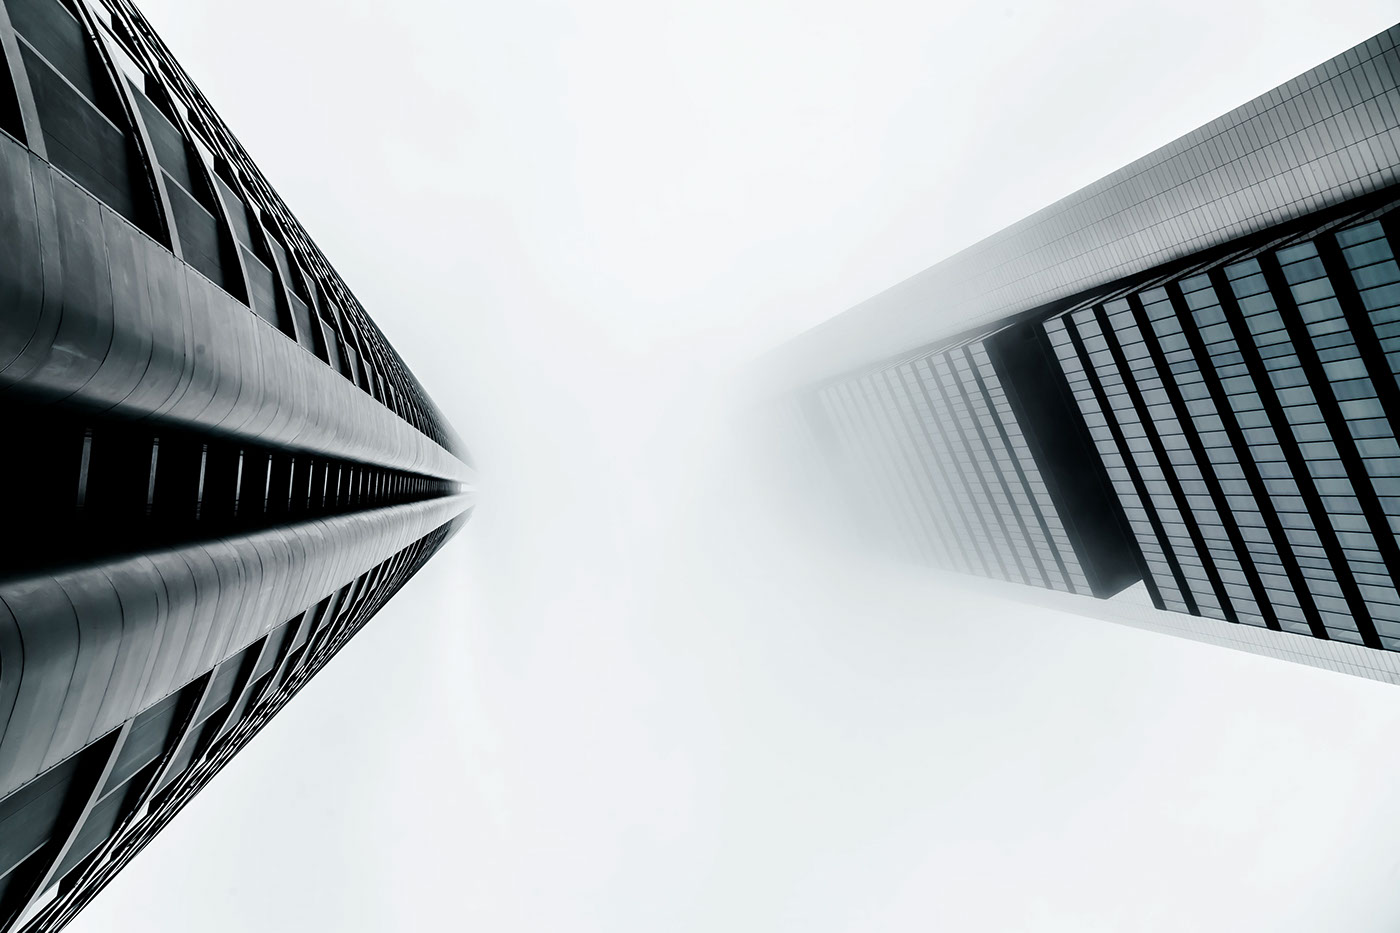 Into the fog - Joel Filipe